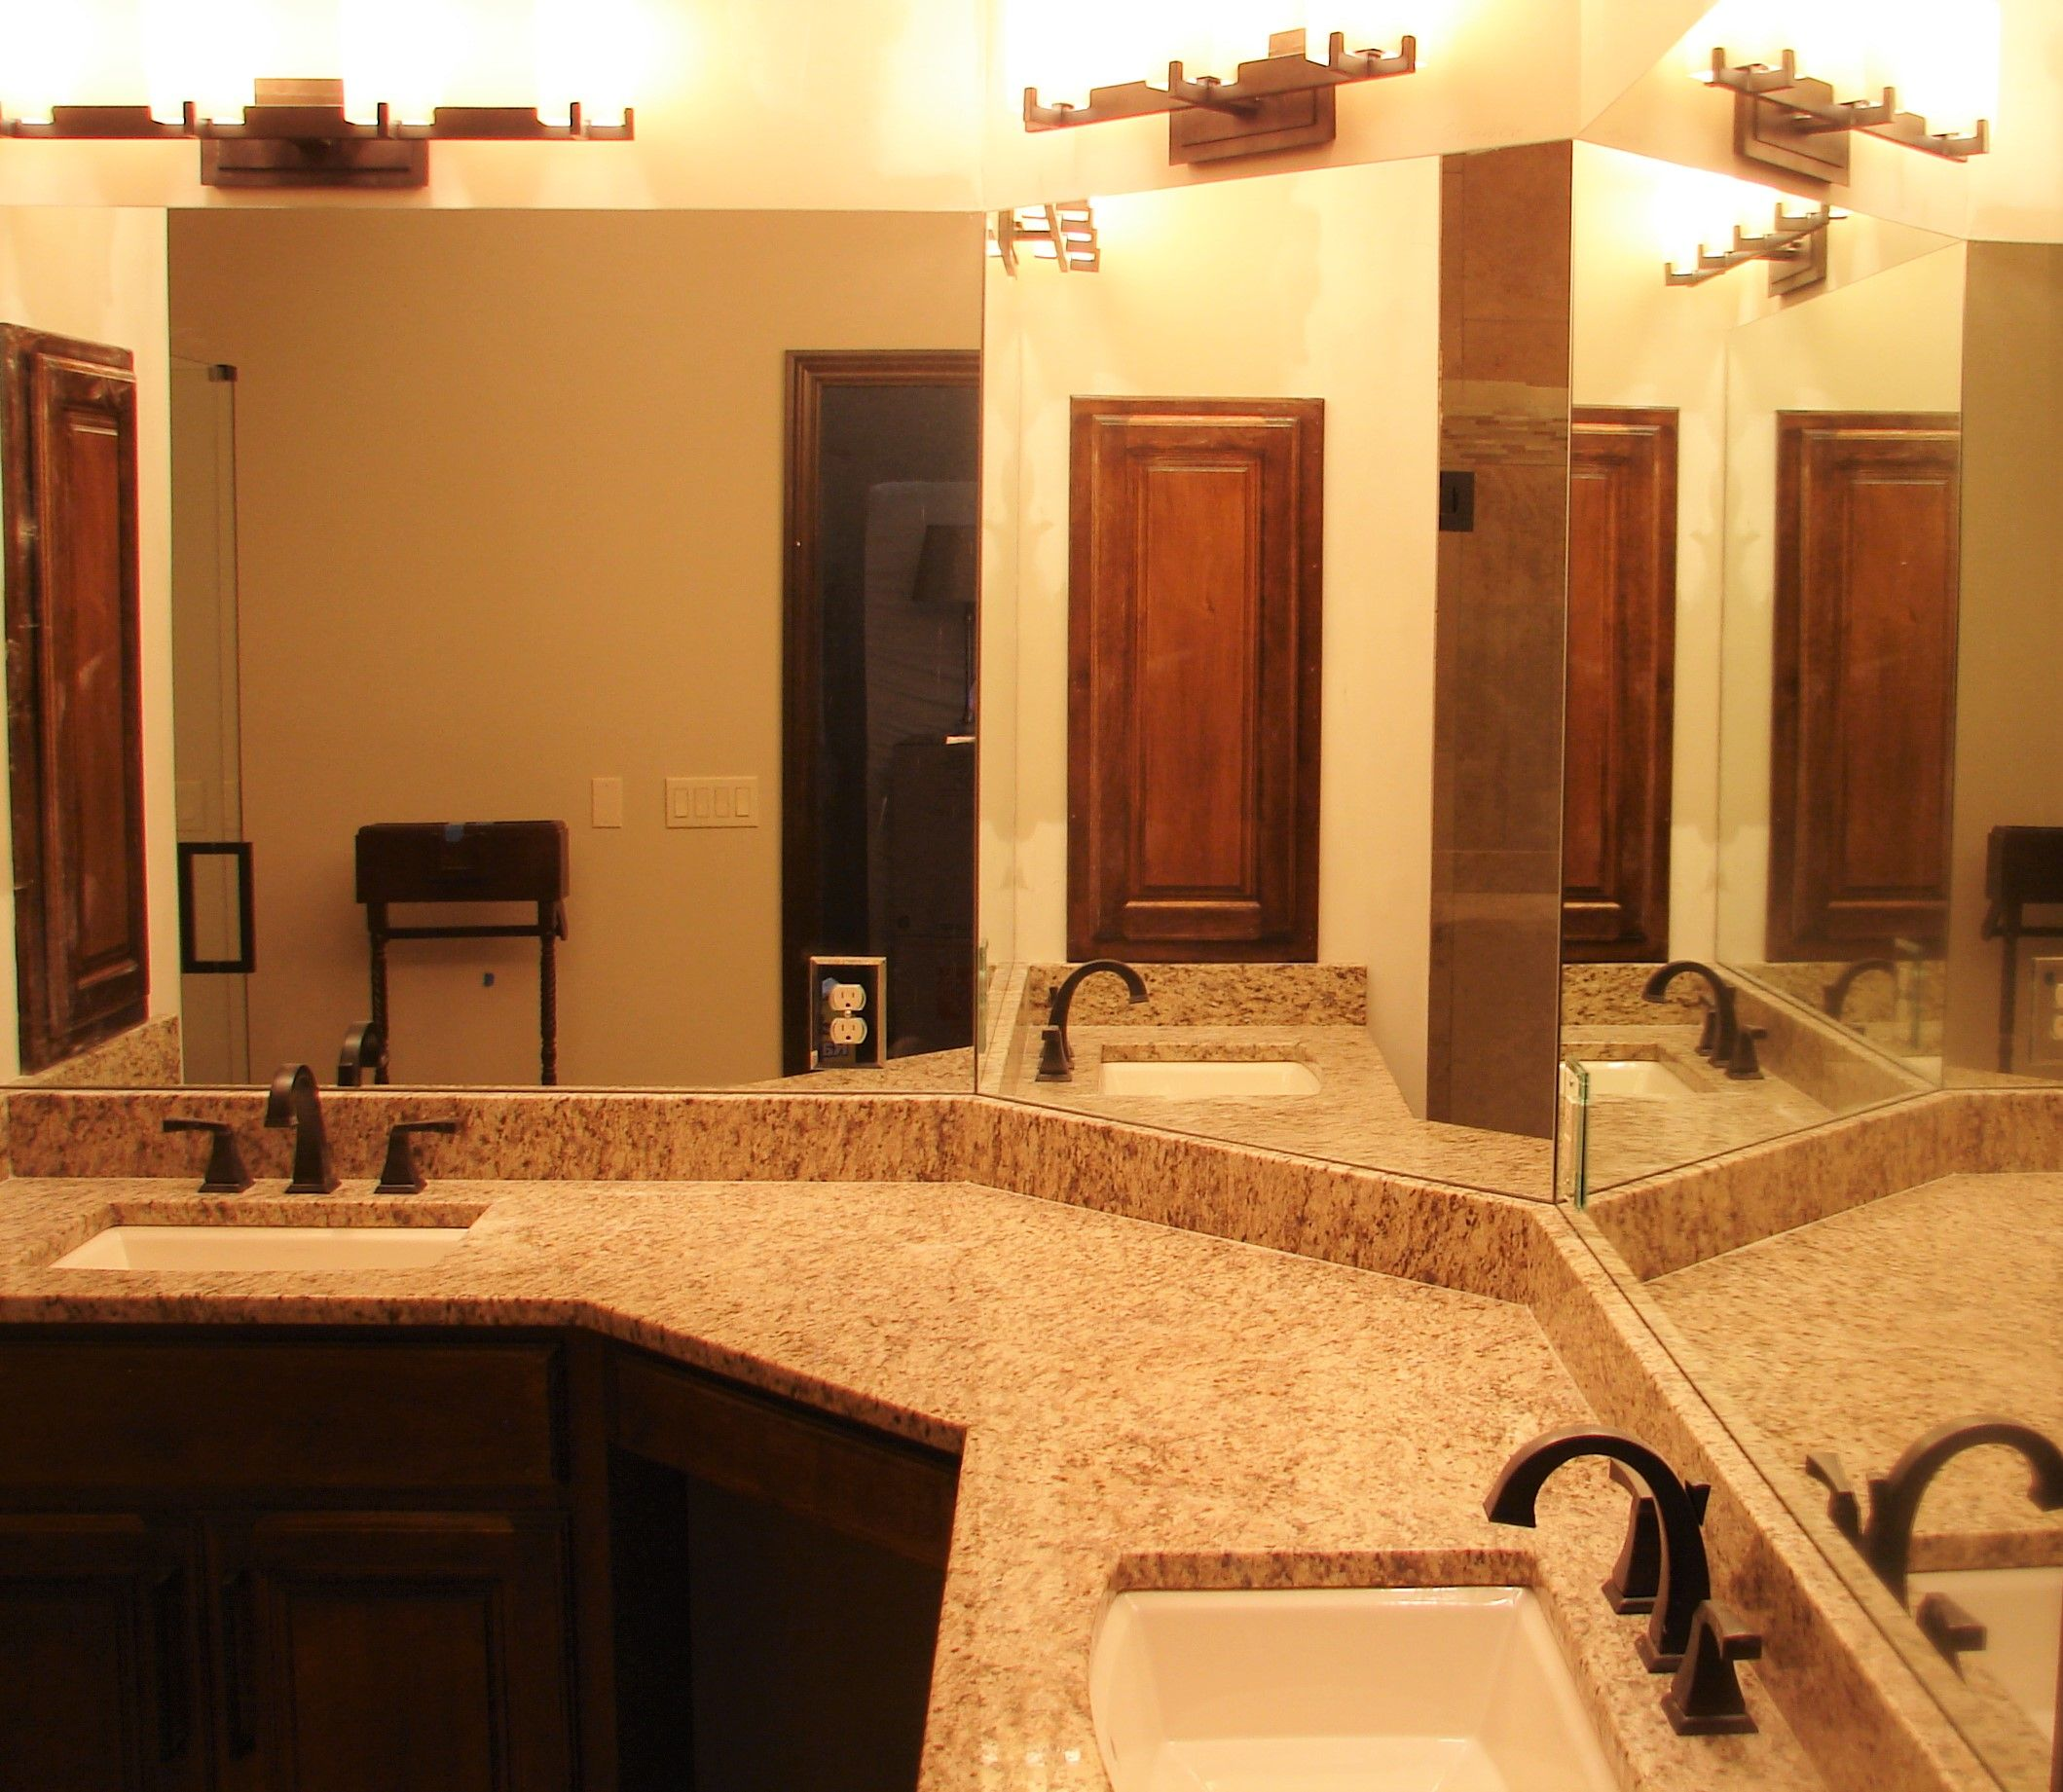 Bathroom Mirrors Omaha three piece mirror, installedelite glass services, inc